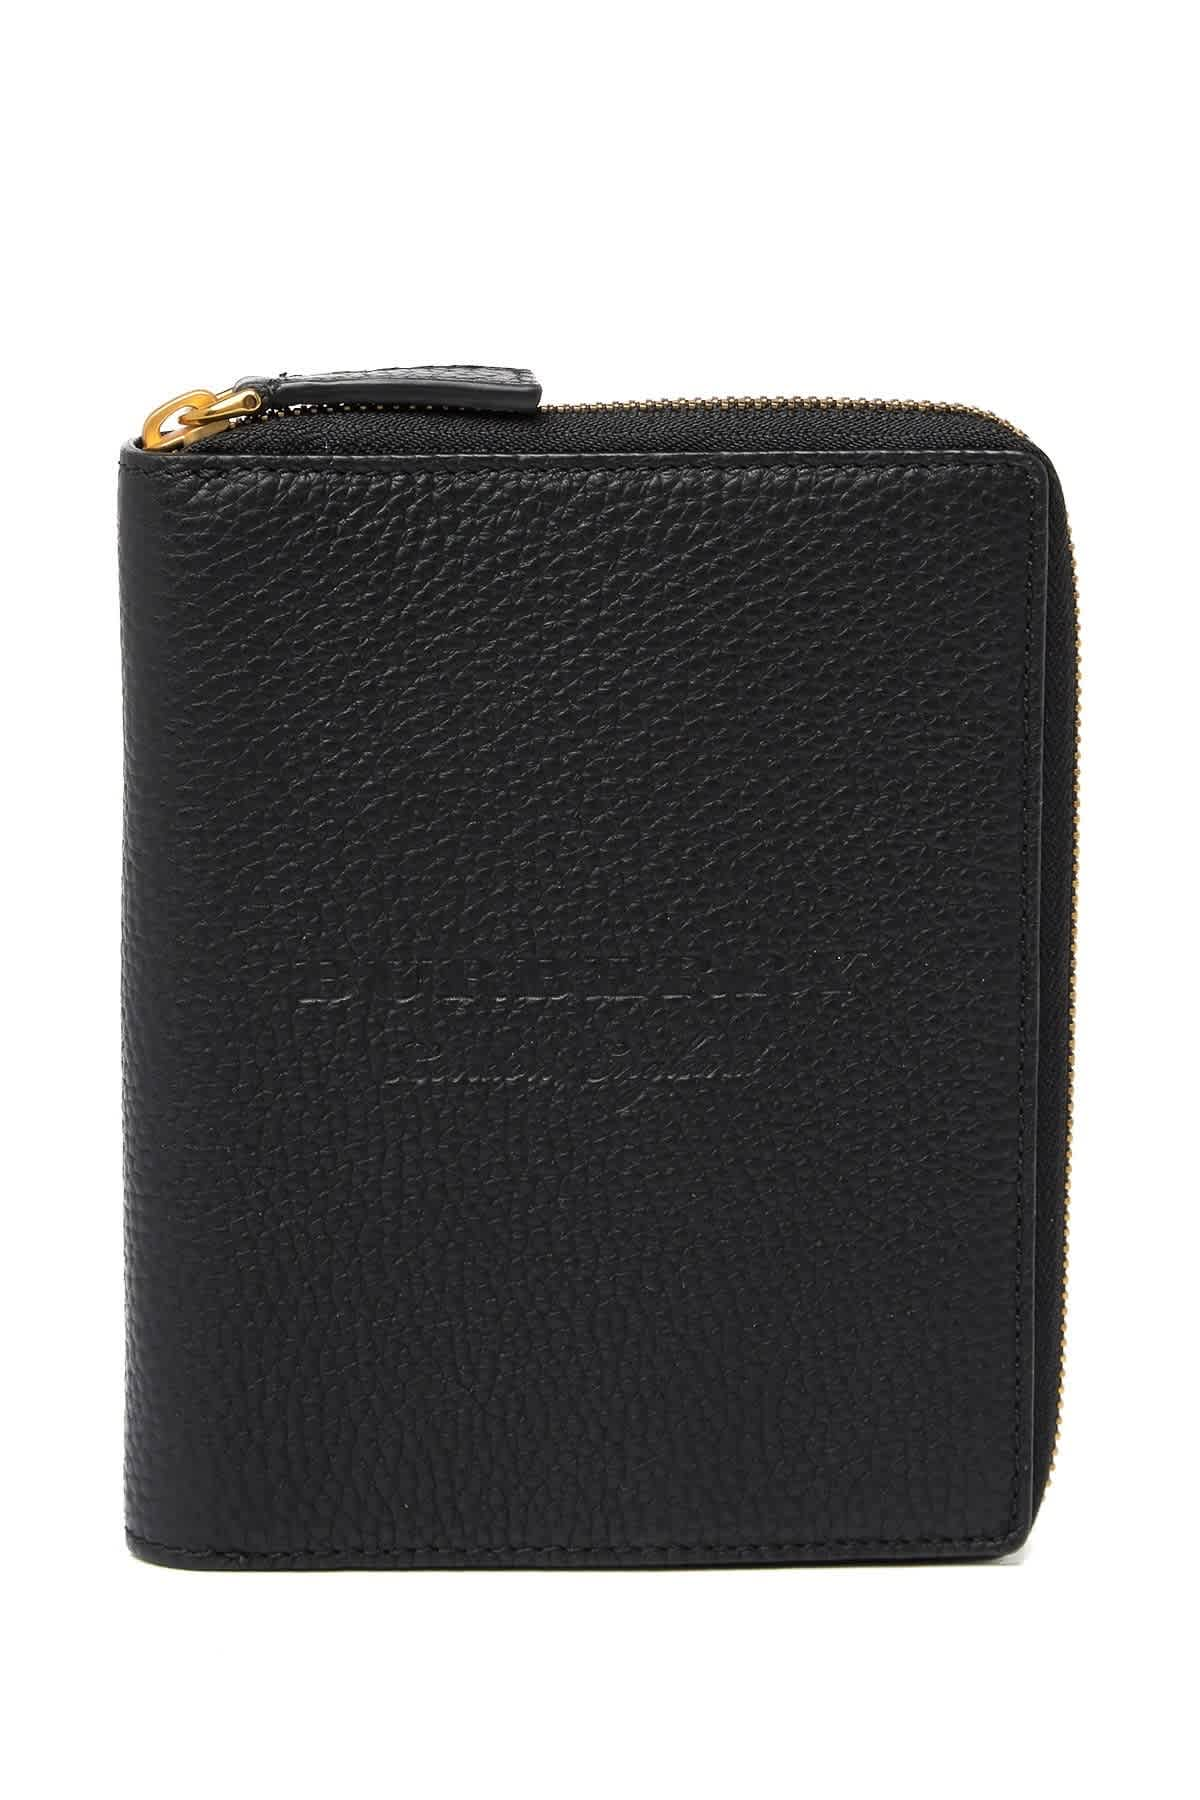 Burberry Ladies Walcott Leather Mini Portfolio In Black